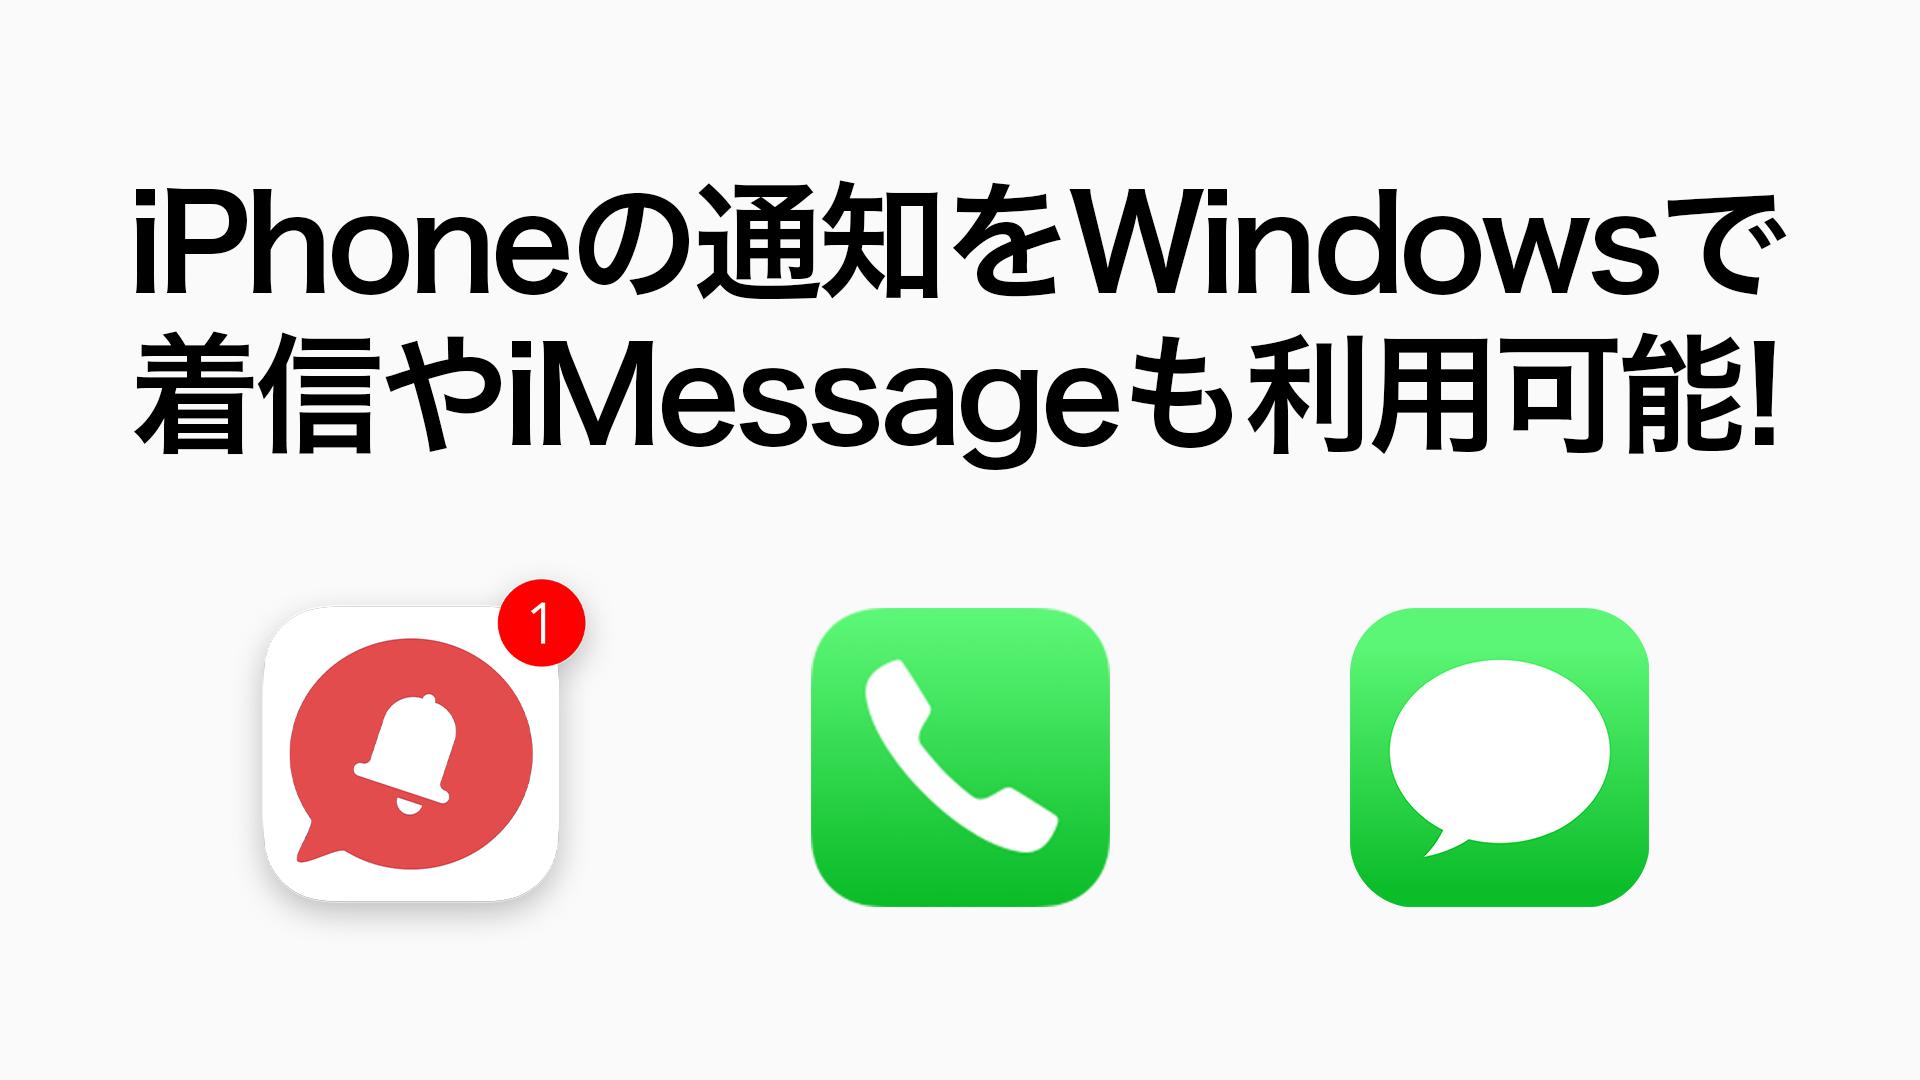 dellmcd - iPhoneに来た通知や通話、iMessageをWindowsでも通知、応答、返信することが可能になるアプリ!